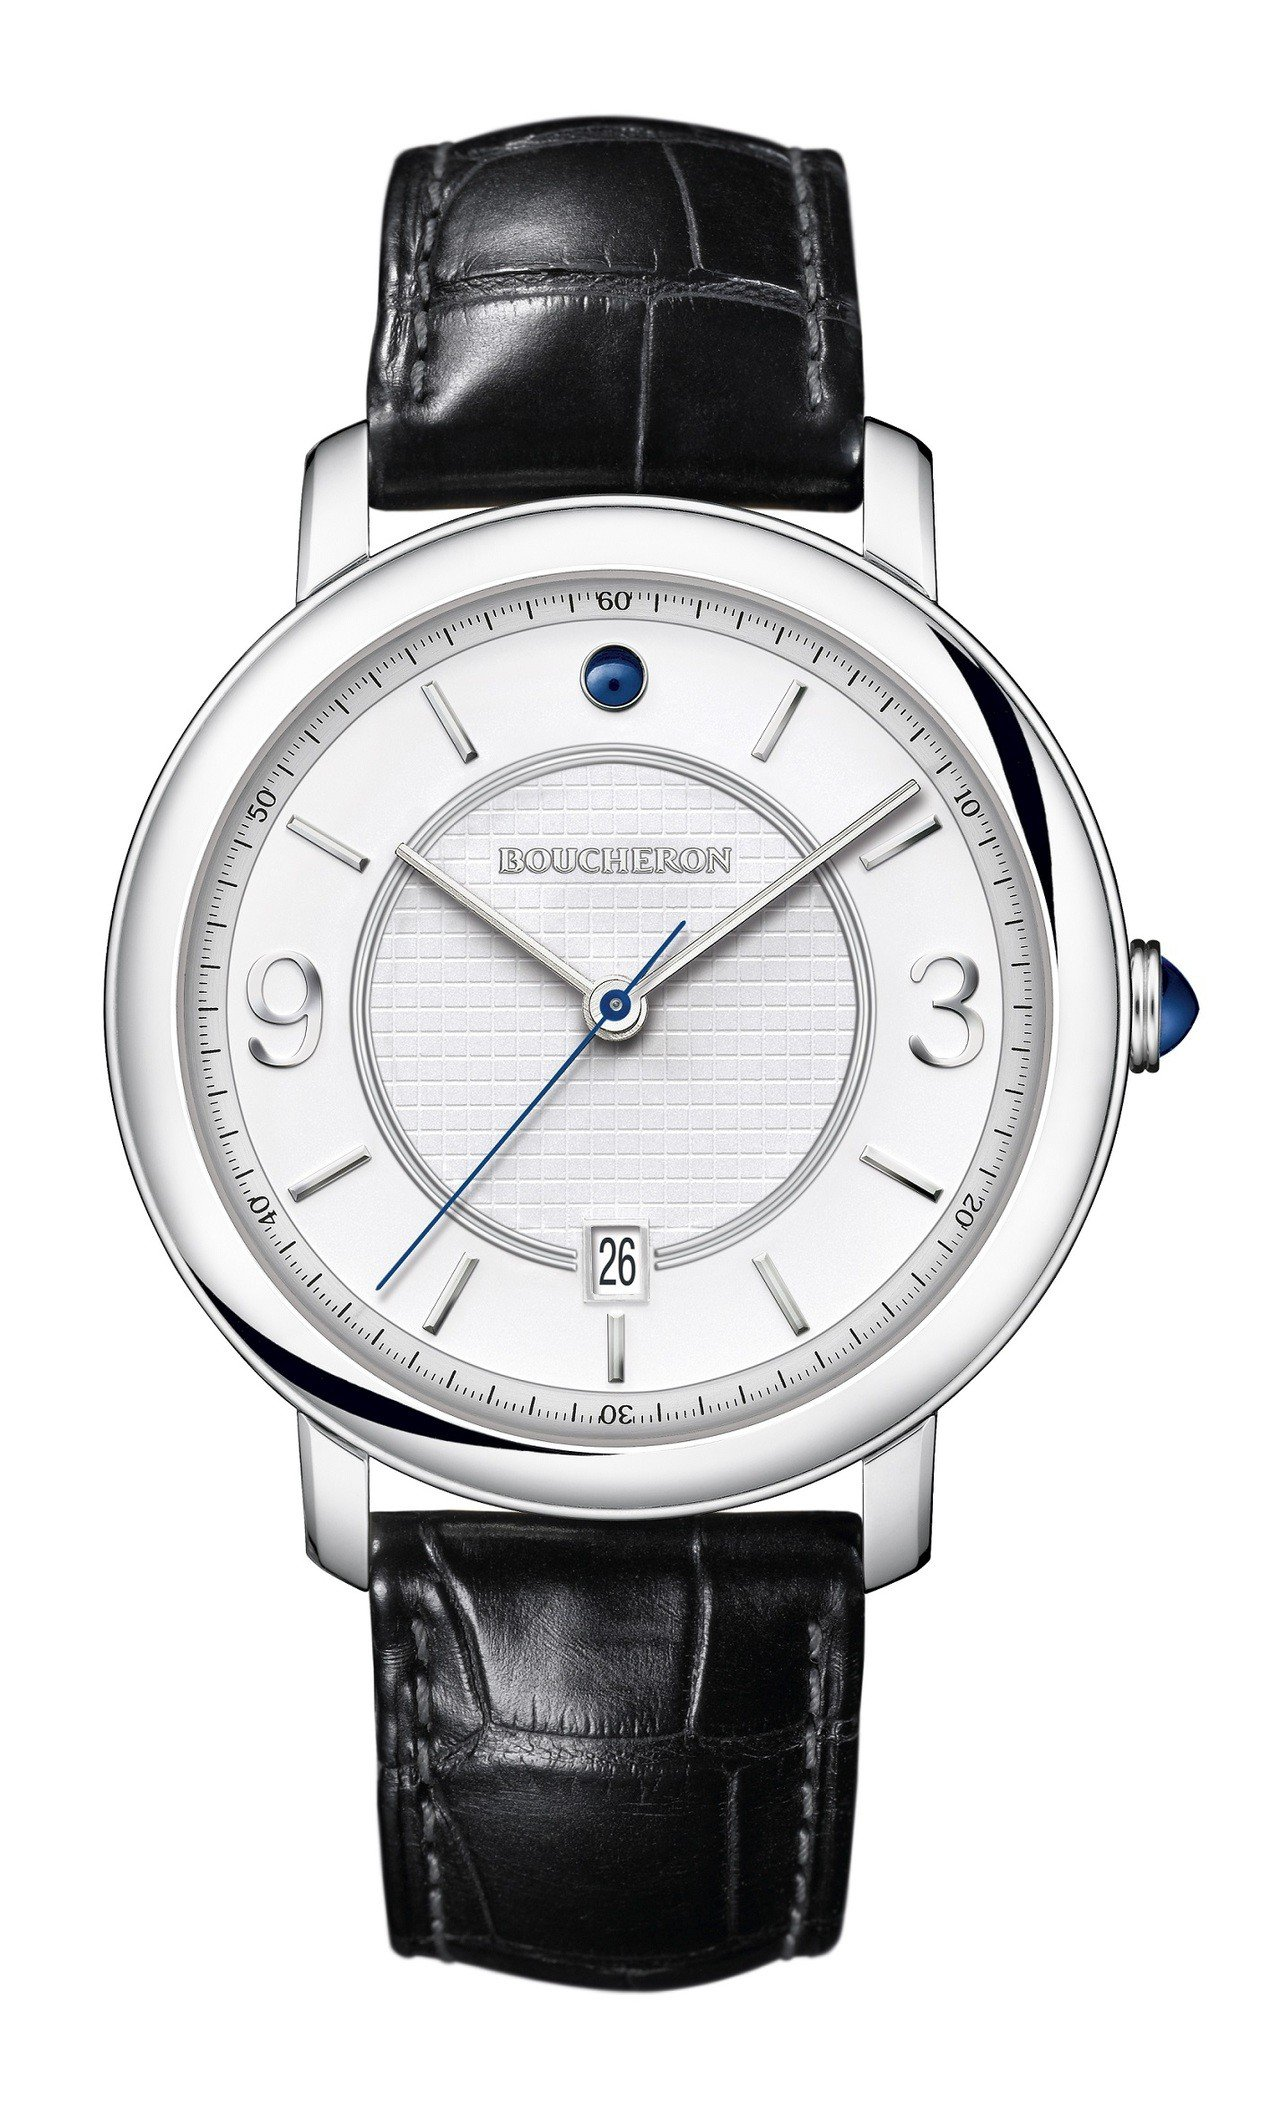 Epure Acier系列42毫米自動上鍊腕表,16萬4,000元。圖/寶詩龍提...